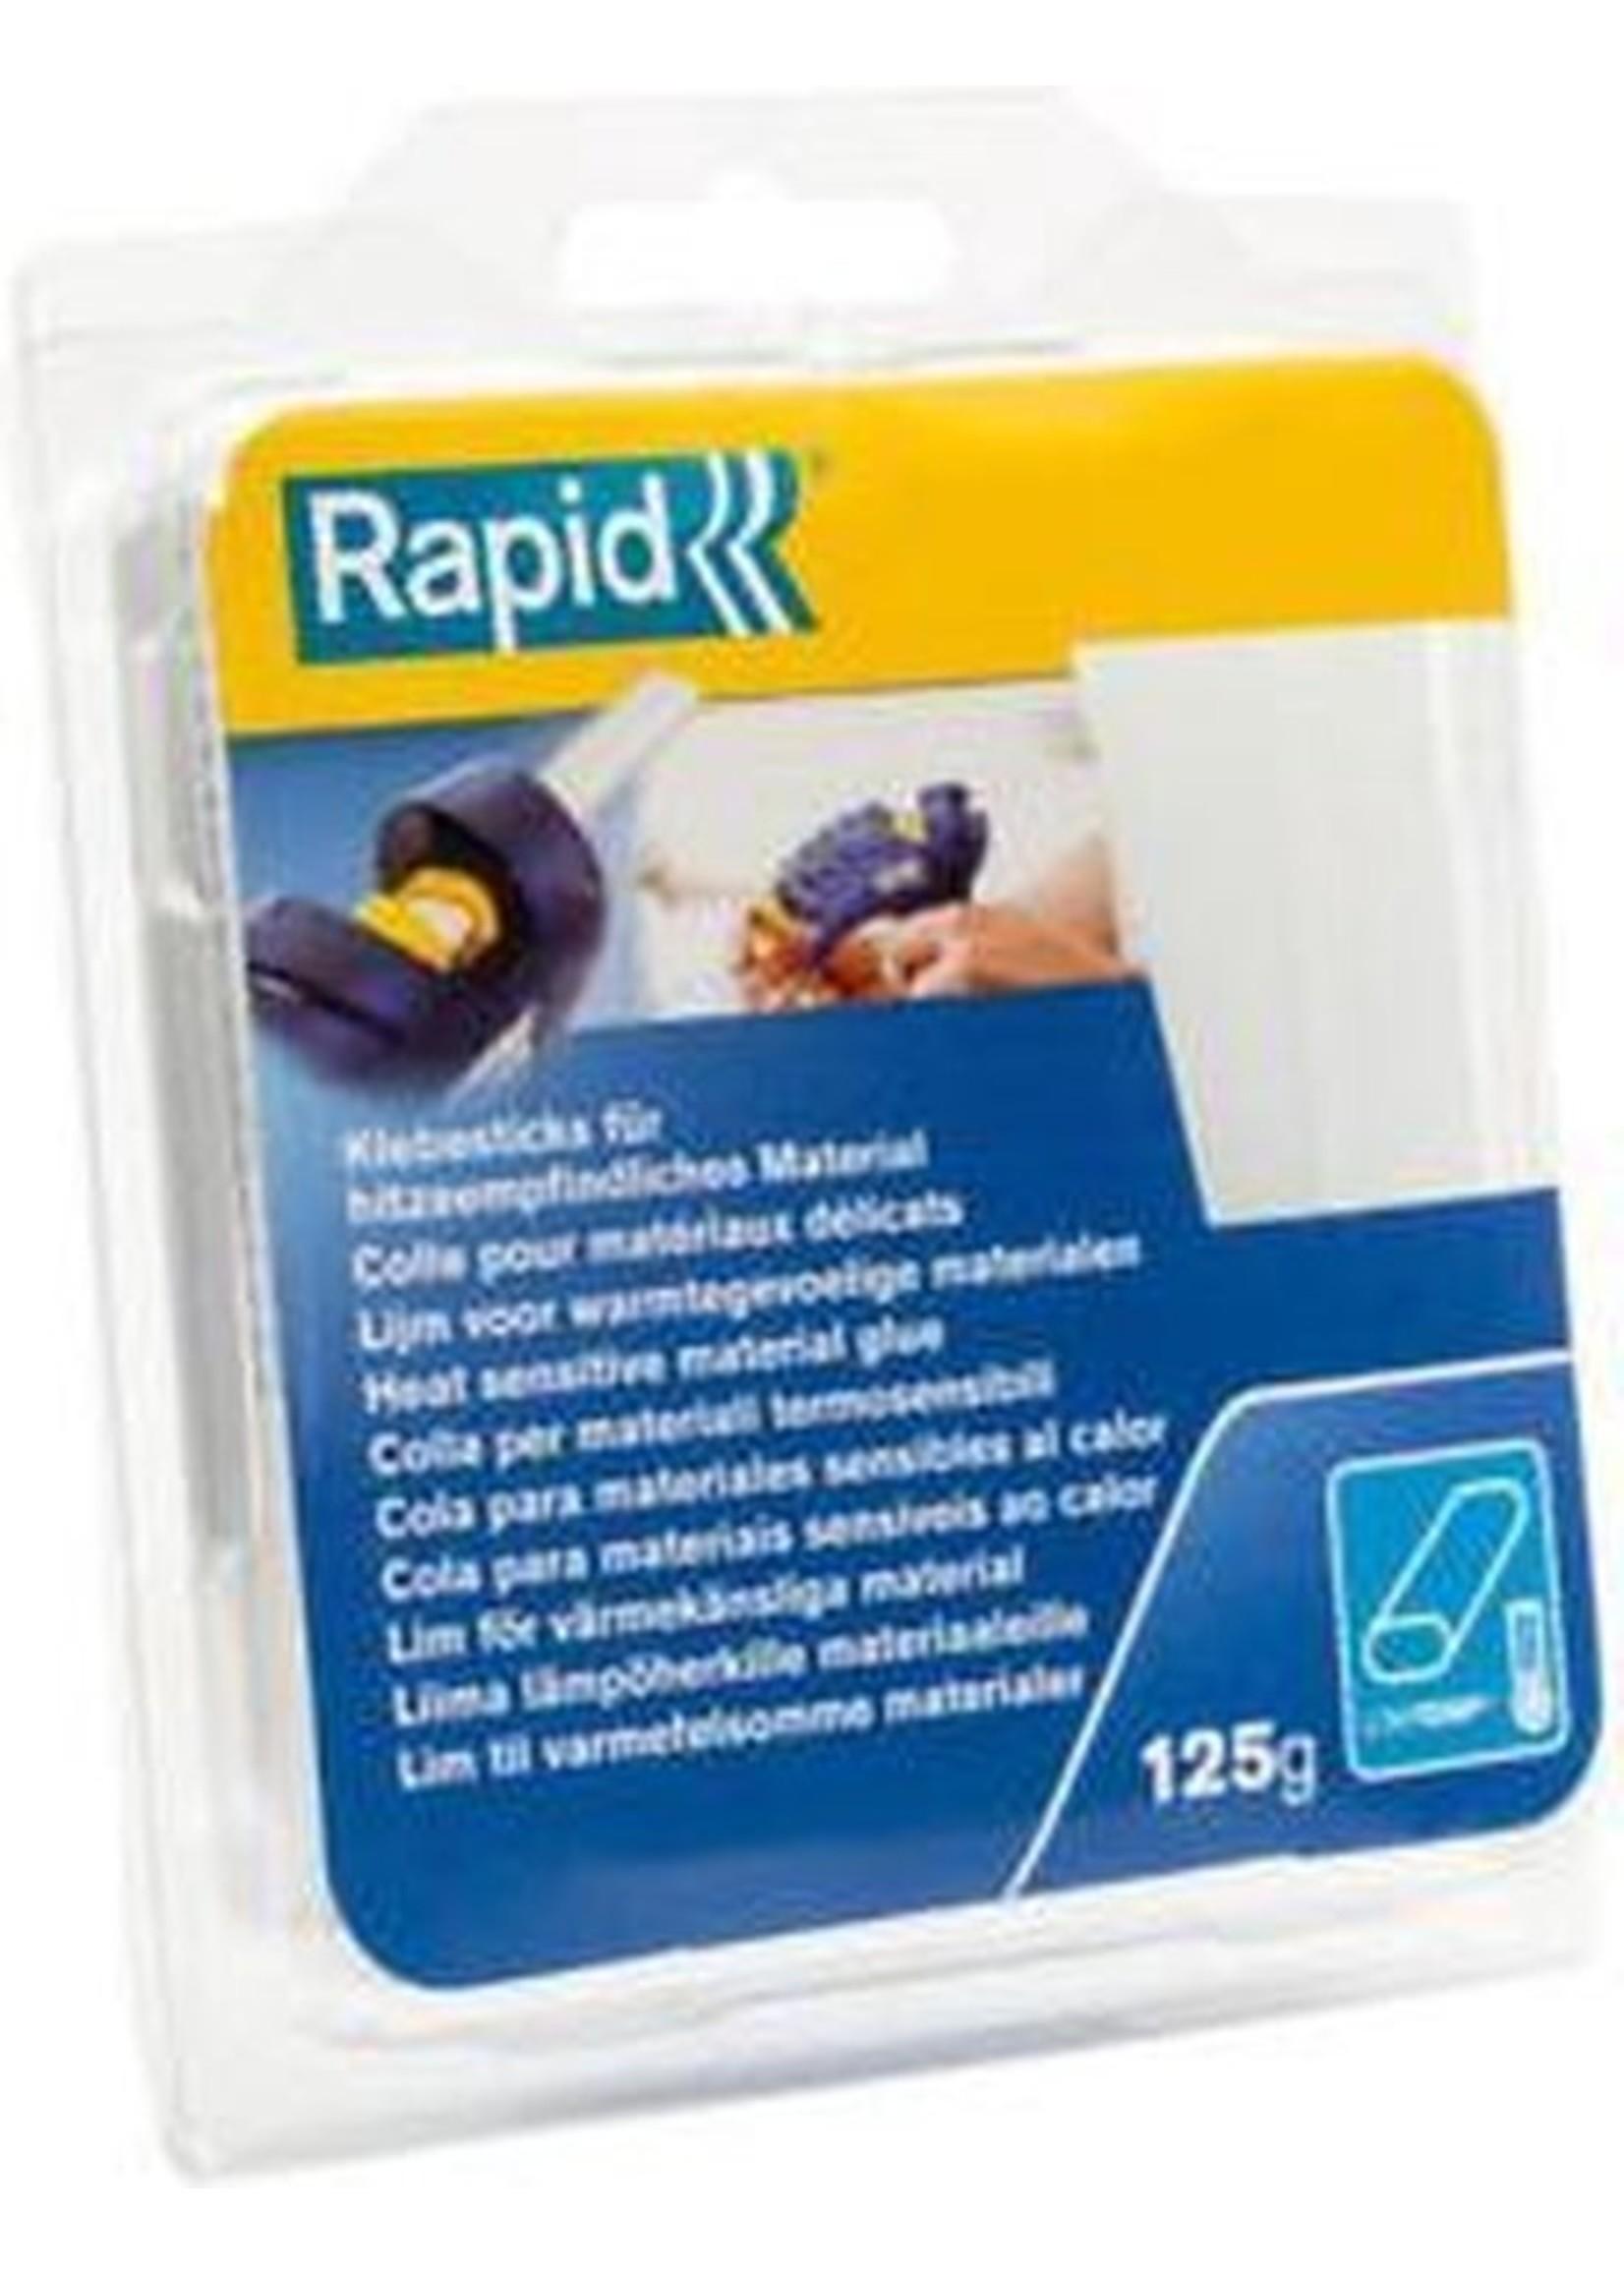 Rapid Rapid lijmpatronen ovaal 9x94mm universeel blister transparant (16)